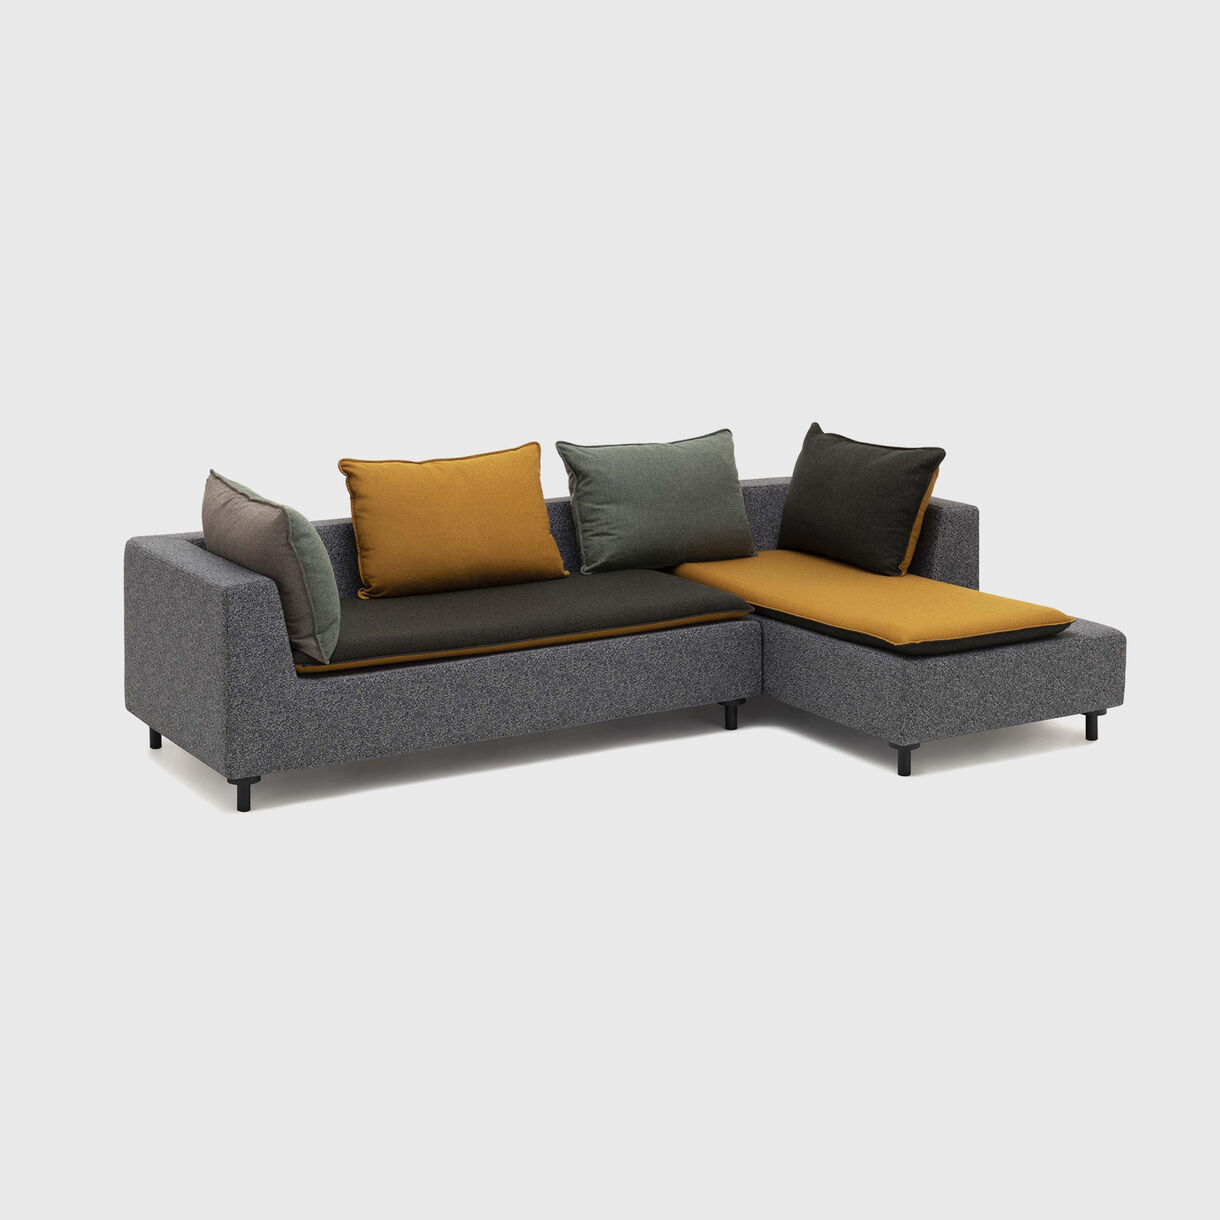 Barbican Corner Sofa, Ochre & Dark Green